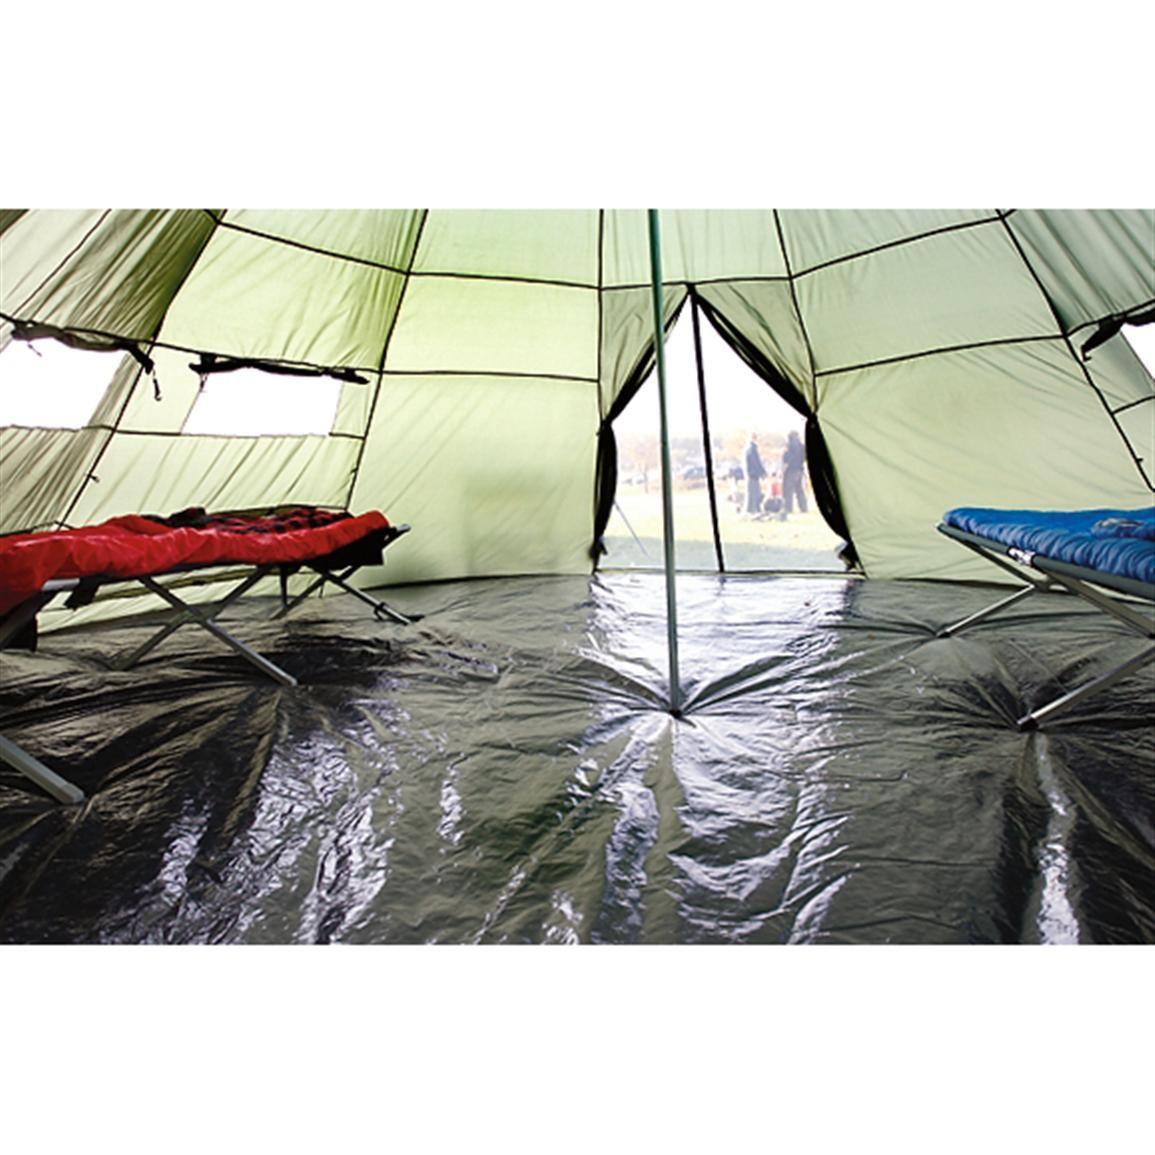 Guide Gear Teepee Tent 18u0027 x 18u0027  sc 1 st  Pinterest & Guide Gear Teepee Tent 18u0027 x 18u0027 | Teepee tent Tents and Camping